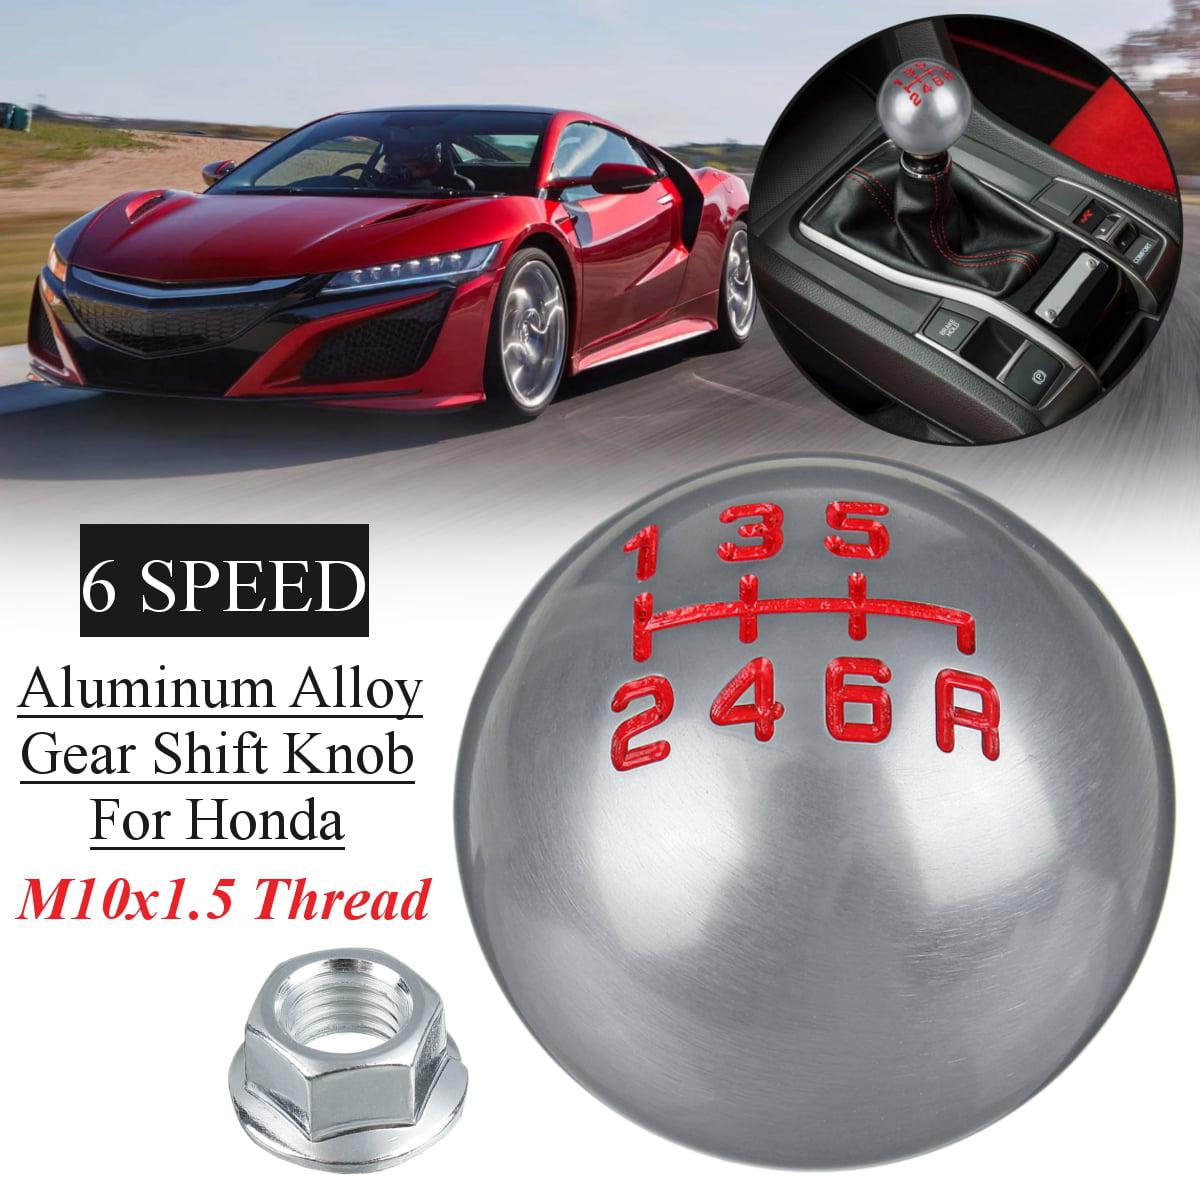 Aluminum Alloy Car Manual Gear Shift Knob Handle Shifter Head 8.5cm for Toyota Honda Gear Shift Knob Colored